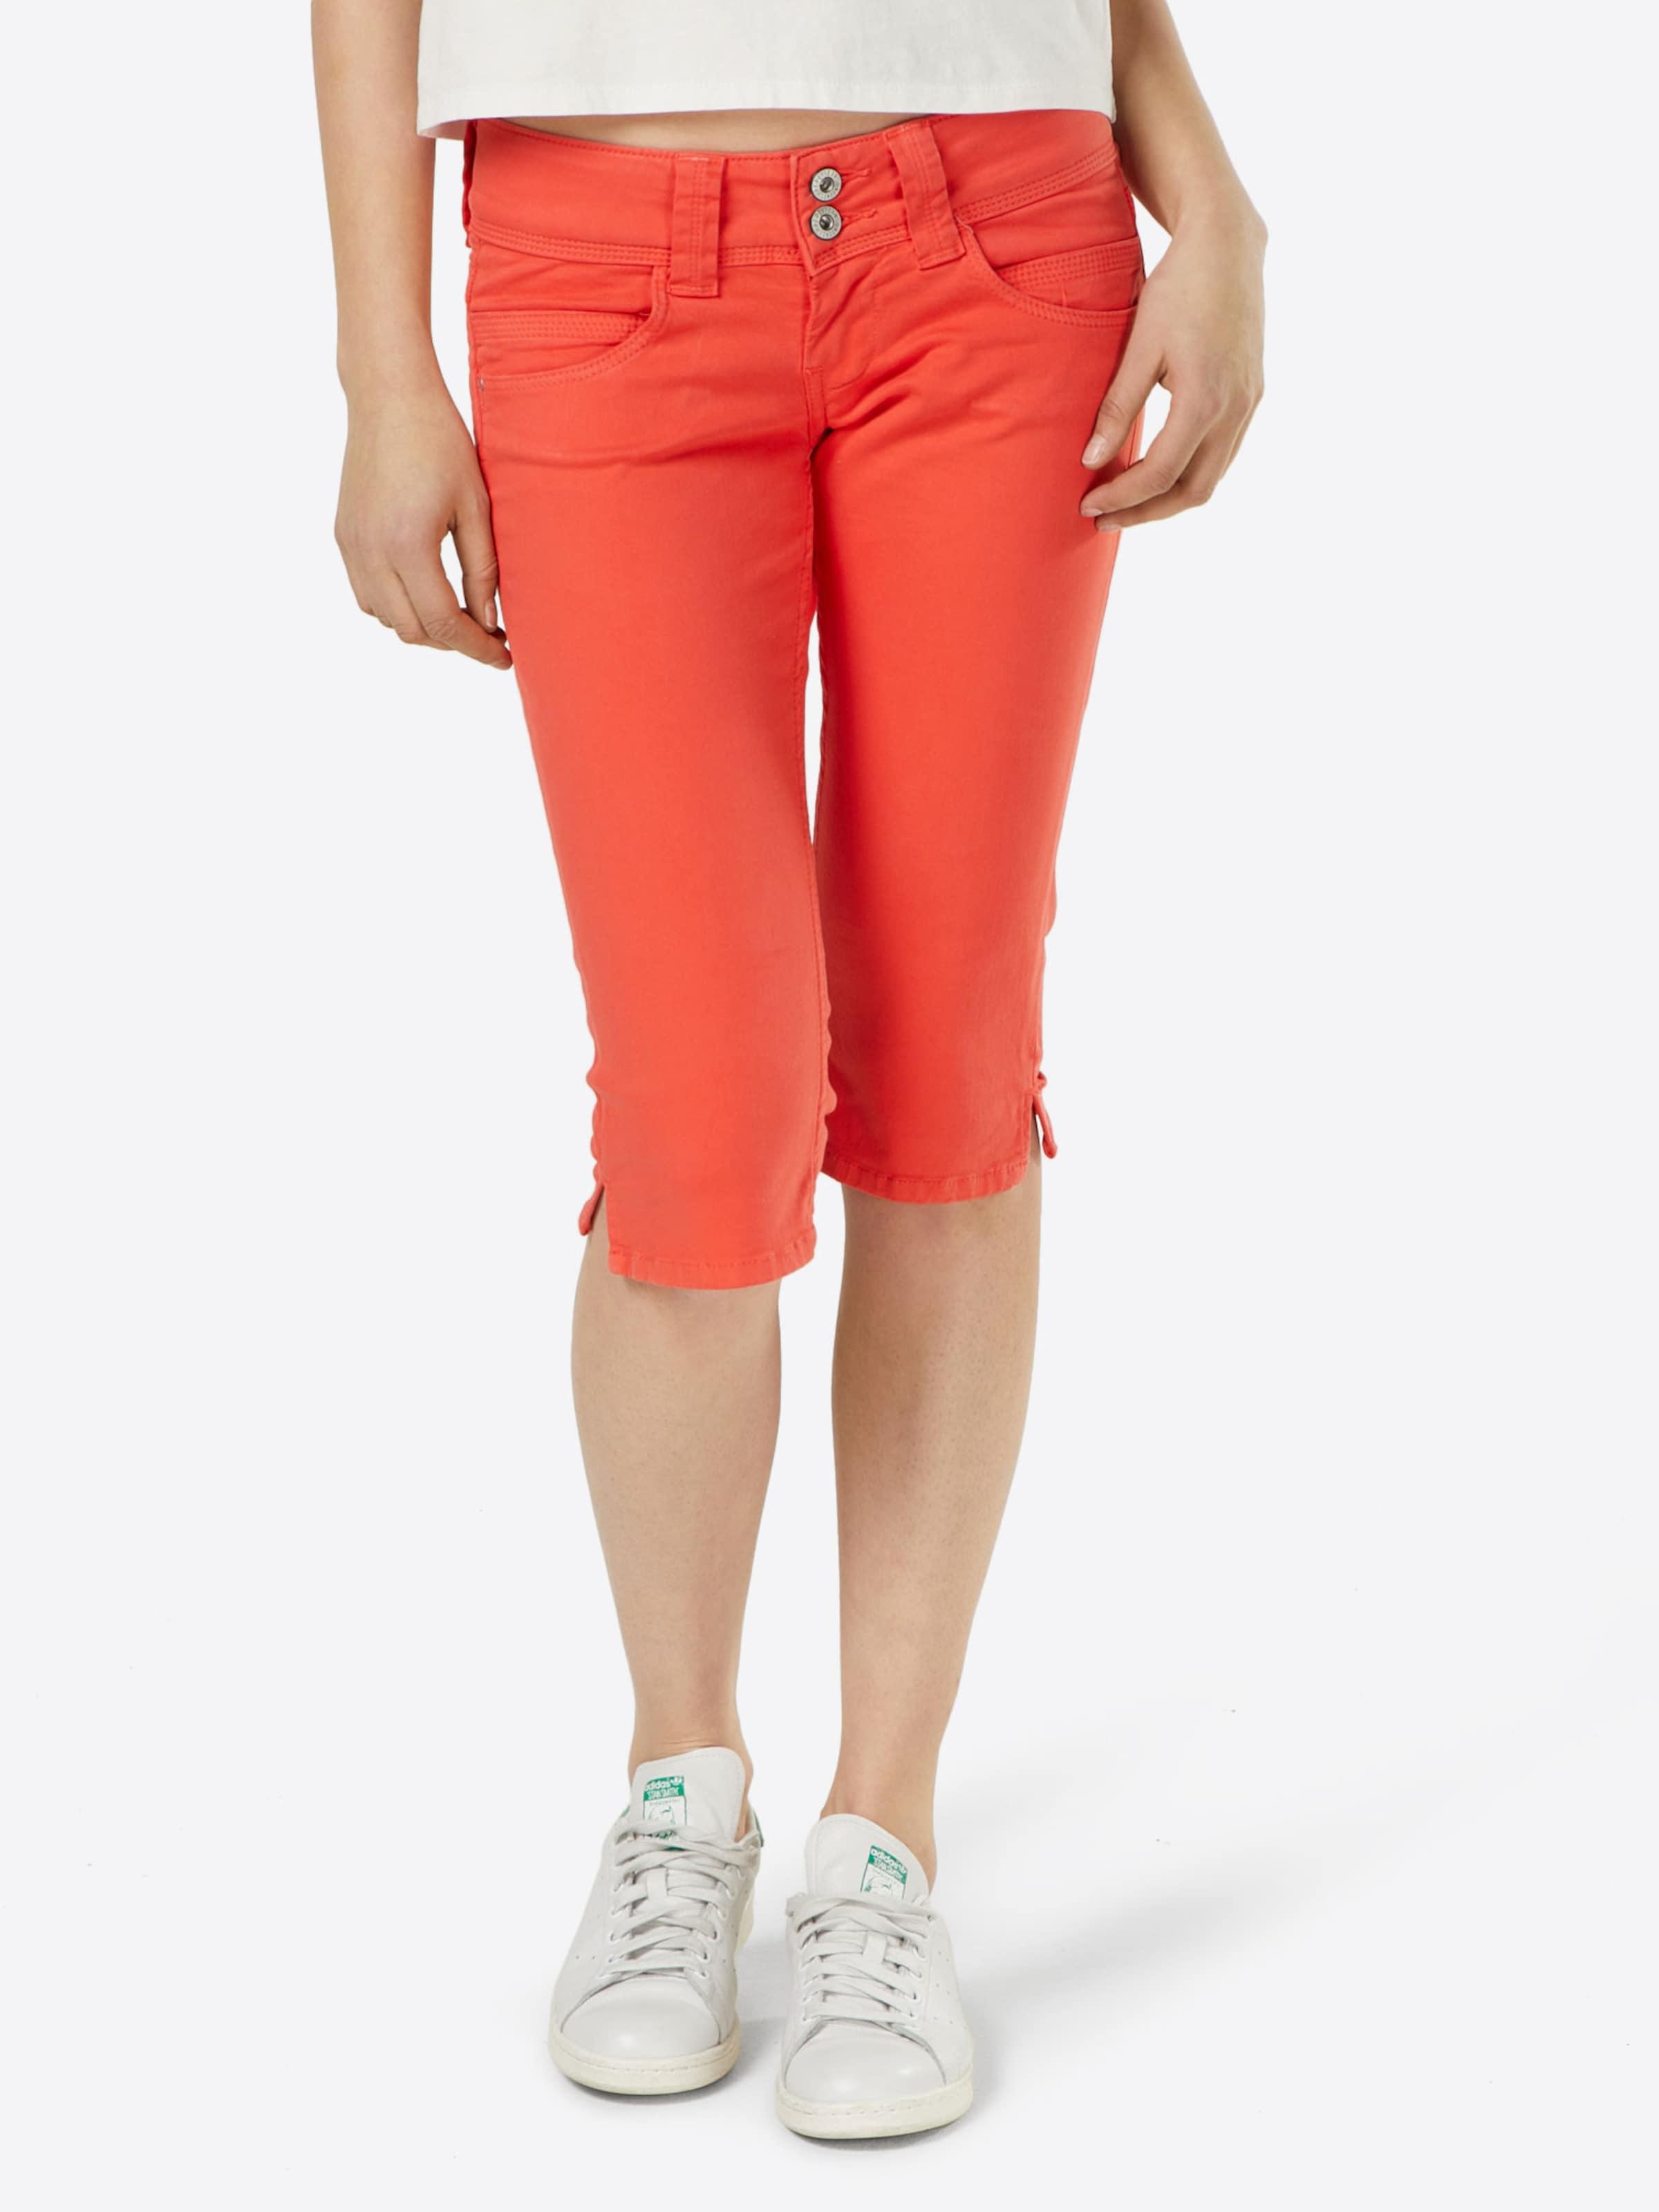 Günstig Kaufen Pepe Jeans Regular Hose 'VENUS CROP' Günstig Kaufen SPKUq90G